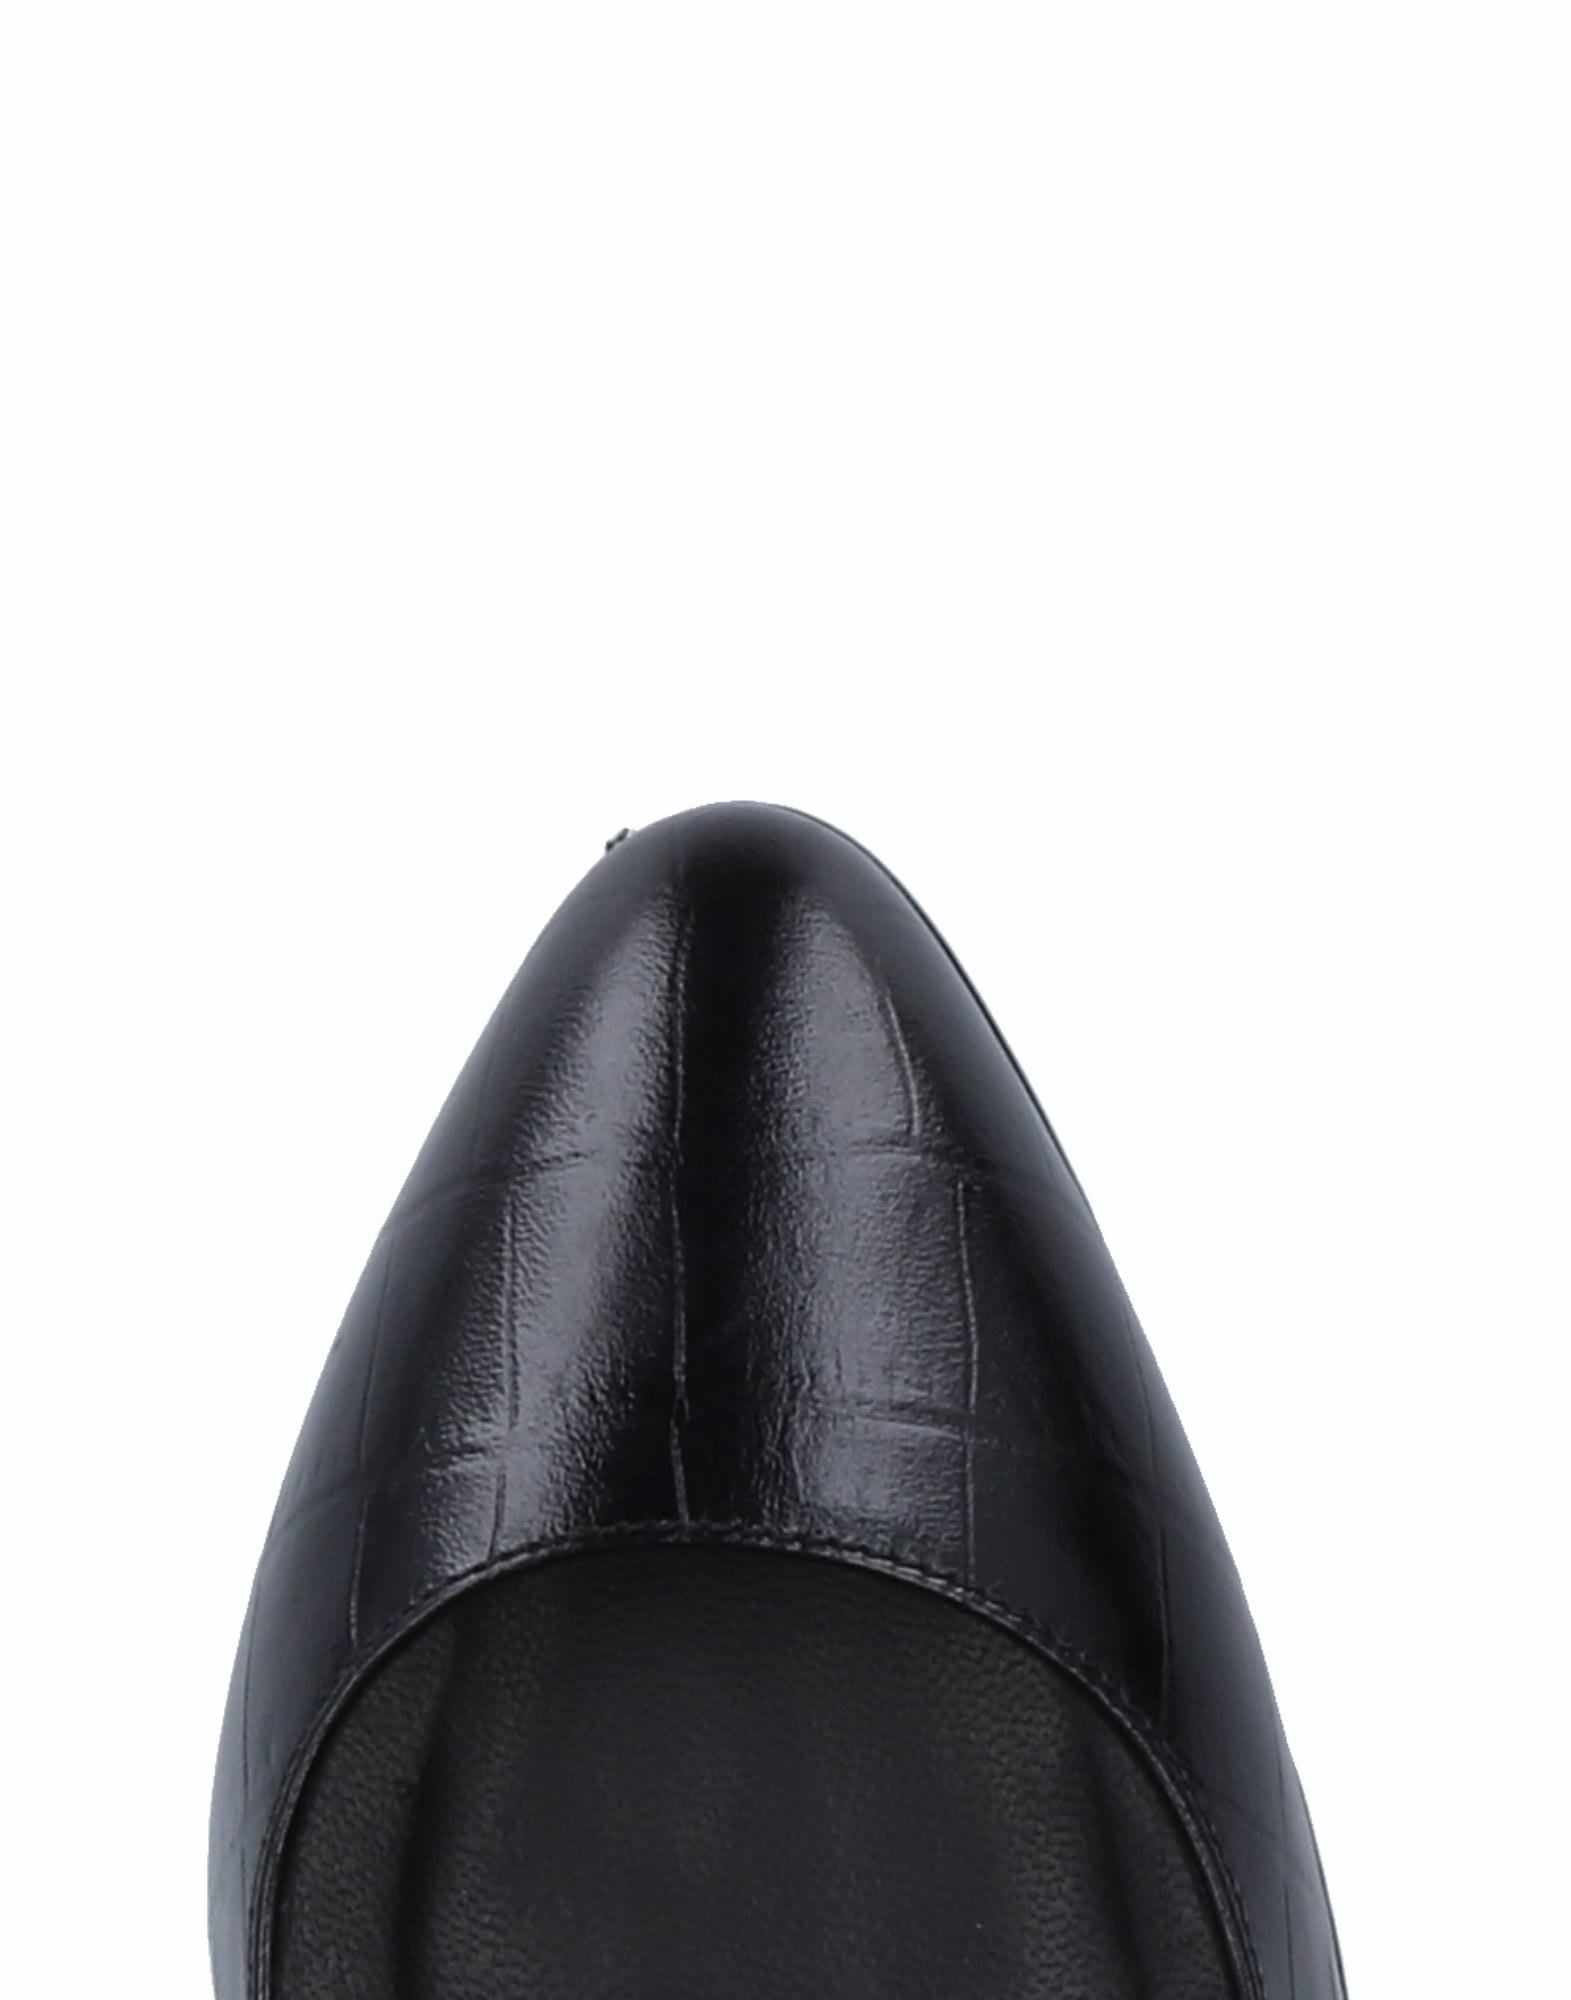 Stilvolle Pumps billige Schuhe Gaia D'este Pumps Stilvolle Damen  11506245CD e3ee03